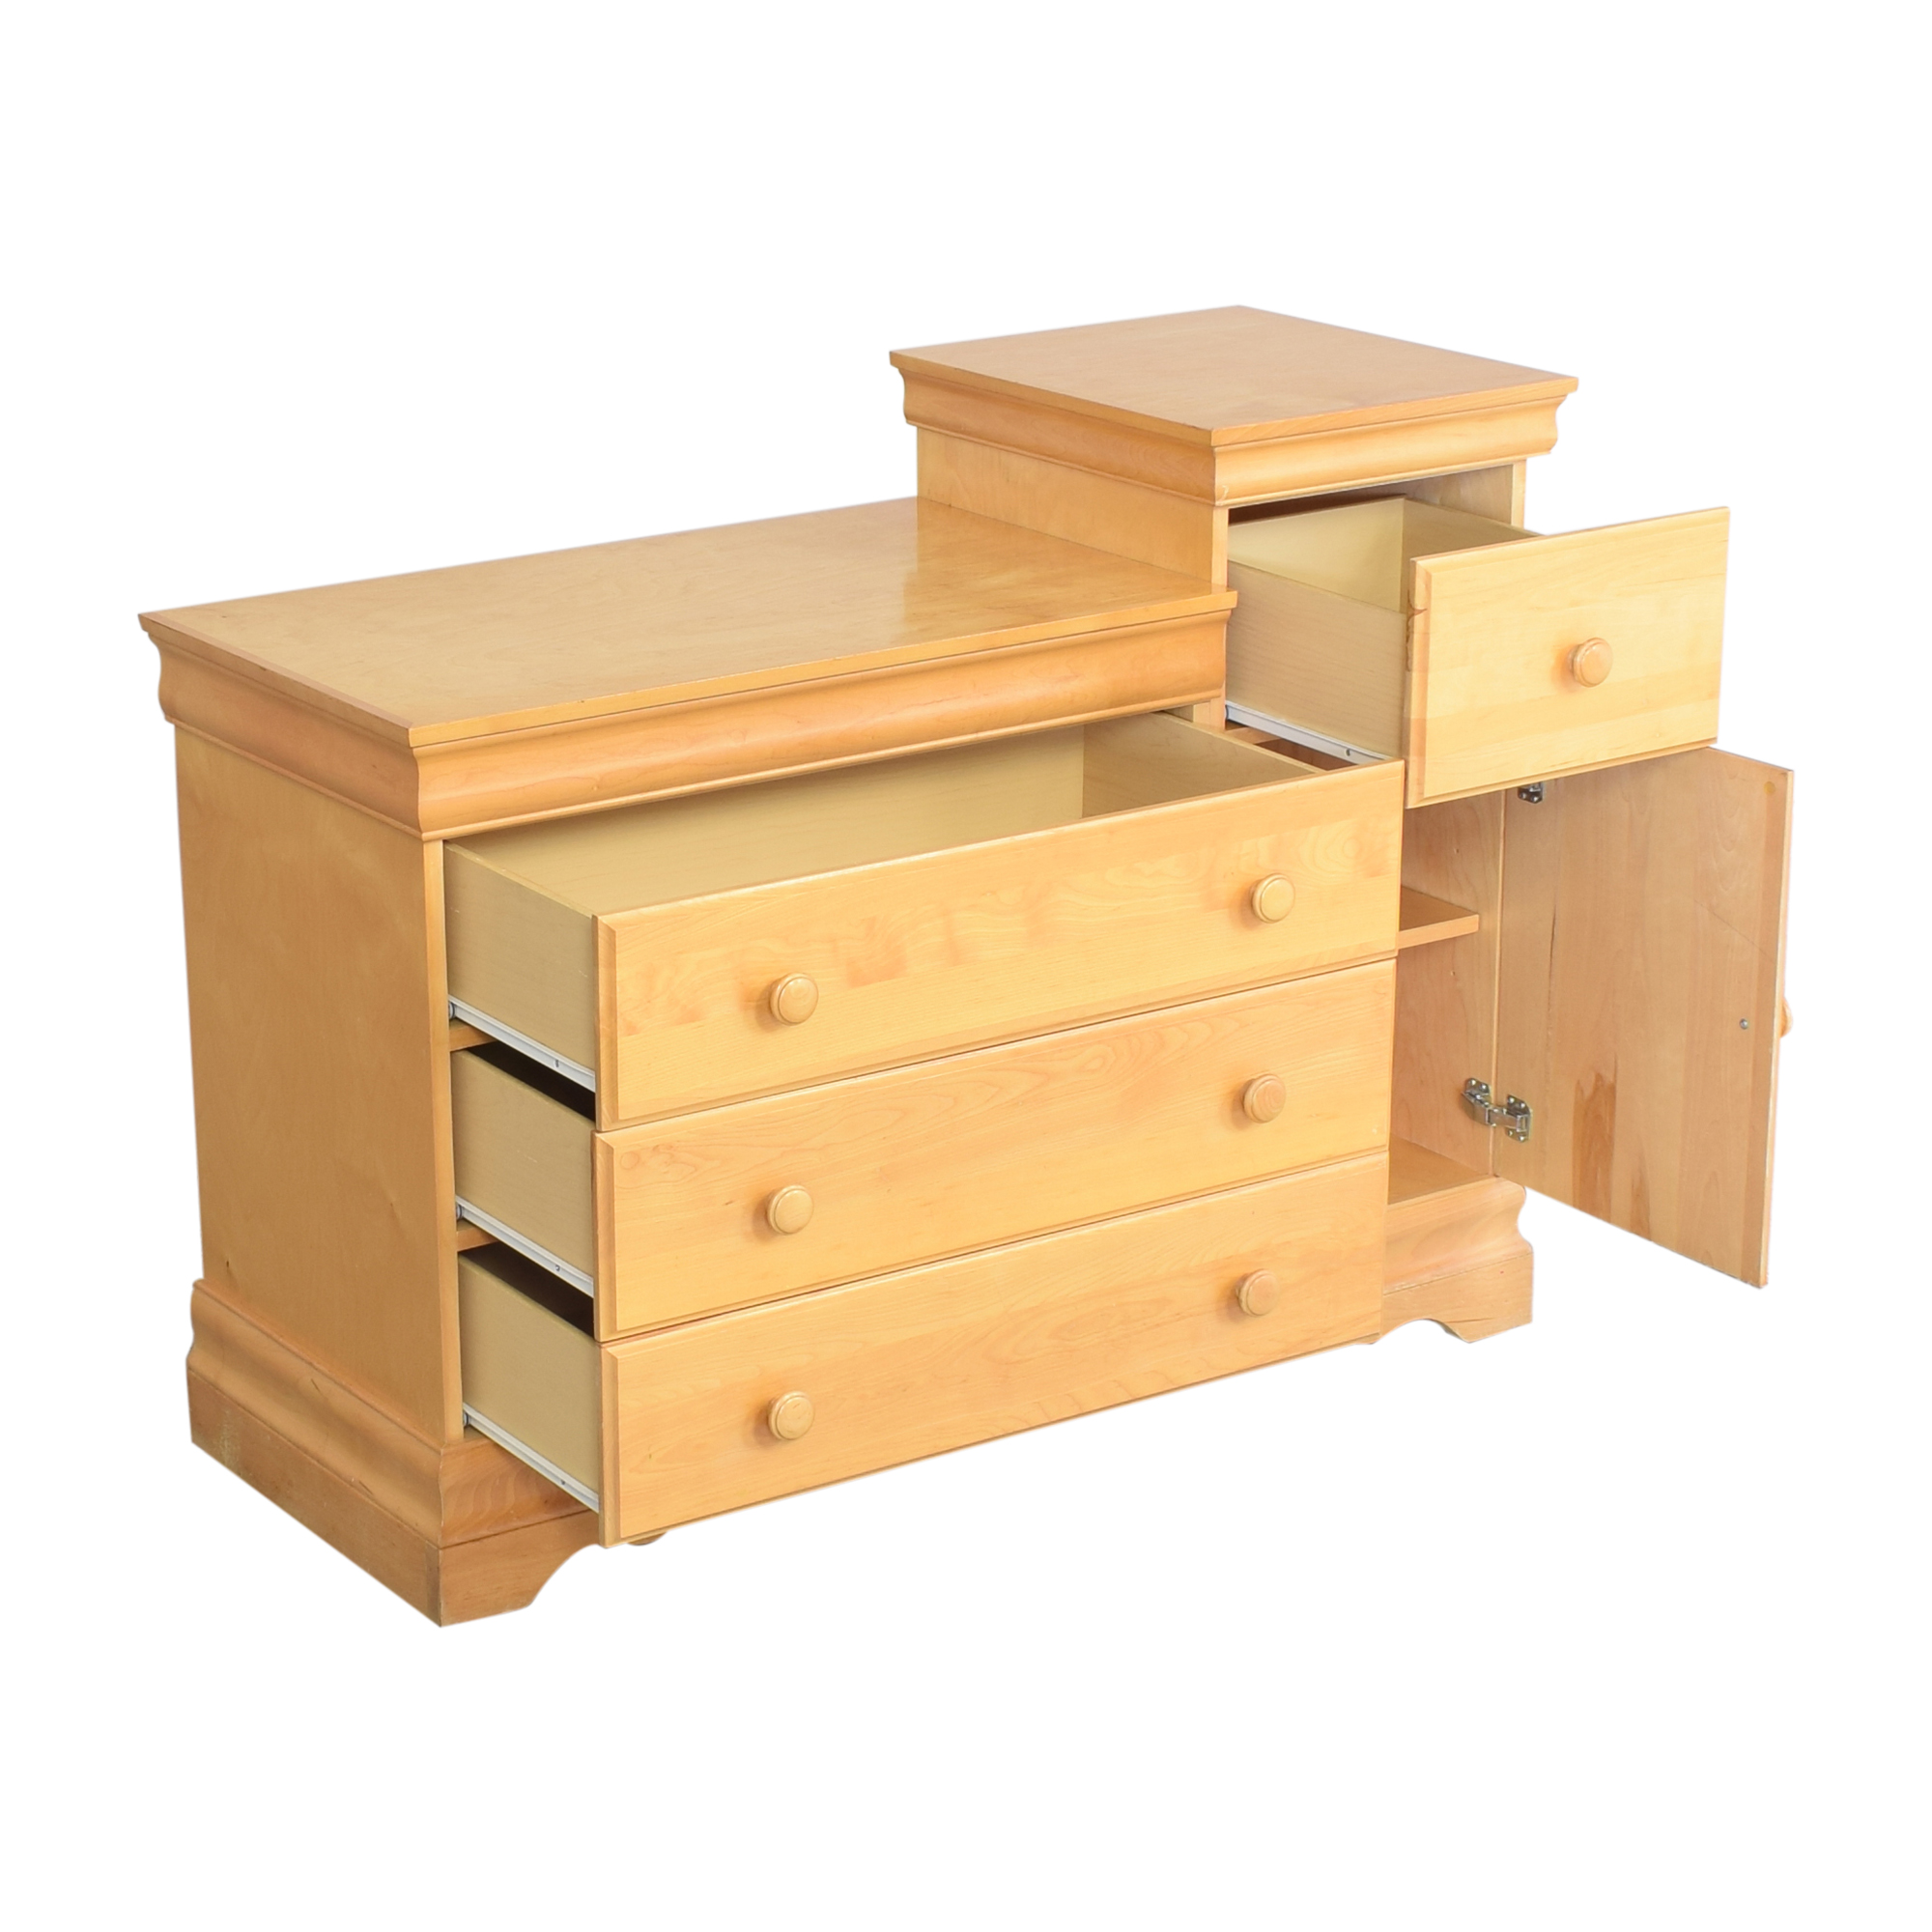 Bonavita Changing Table Dresser / Dressers